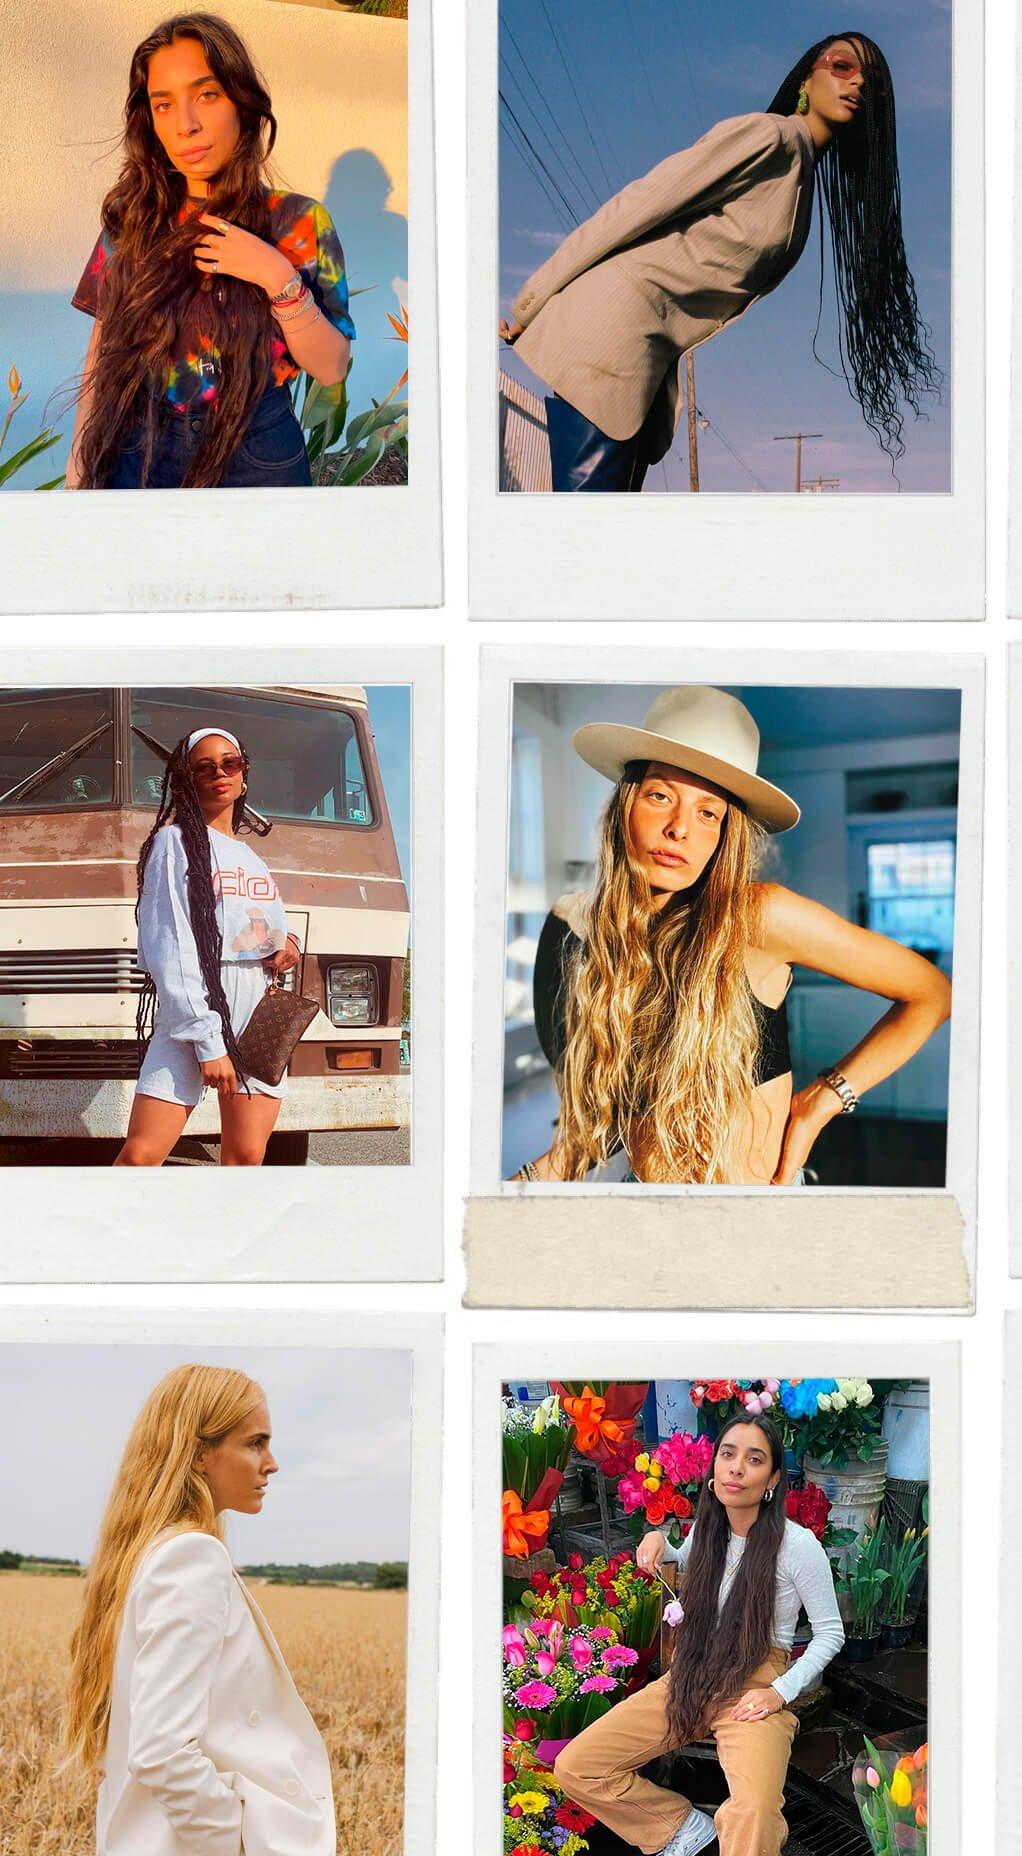 It girls - Cabelos longos - Cabelos longos - Inverno - Street Style - https://stealthelook.com.br